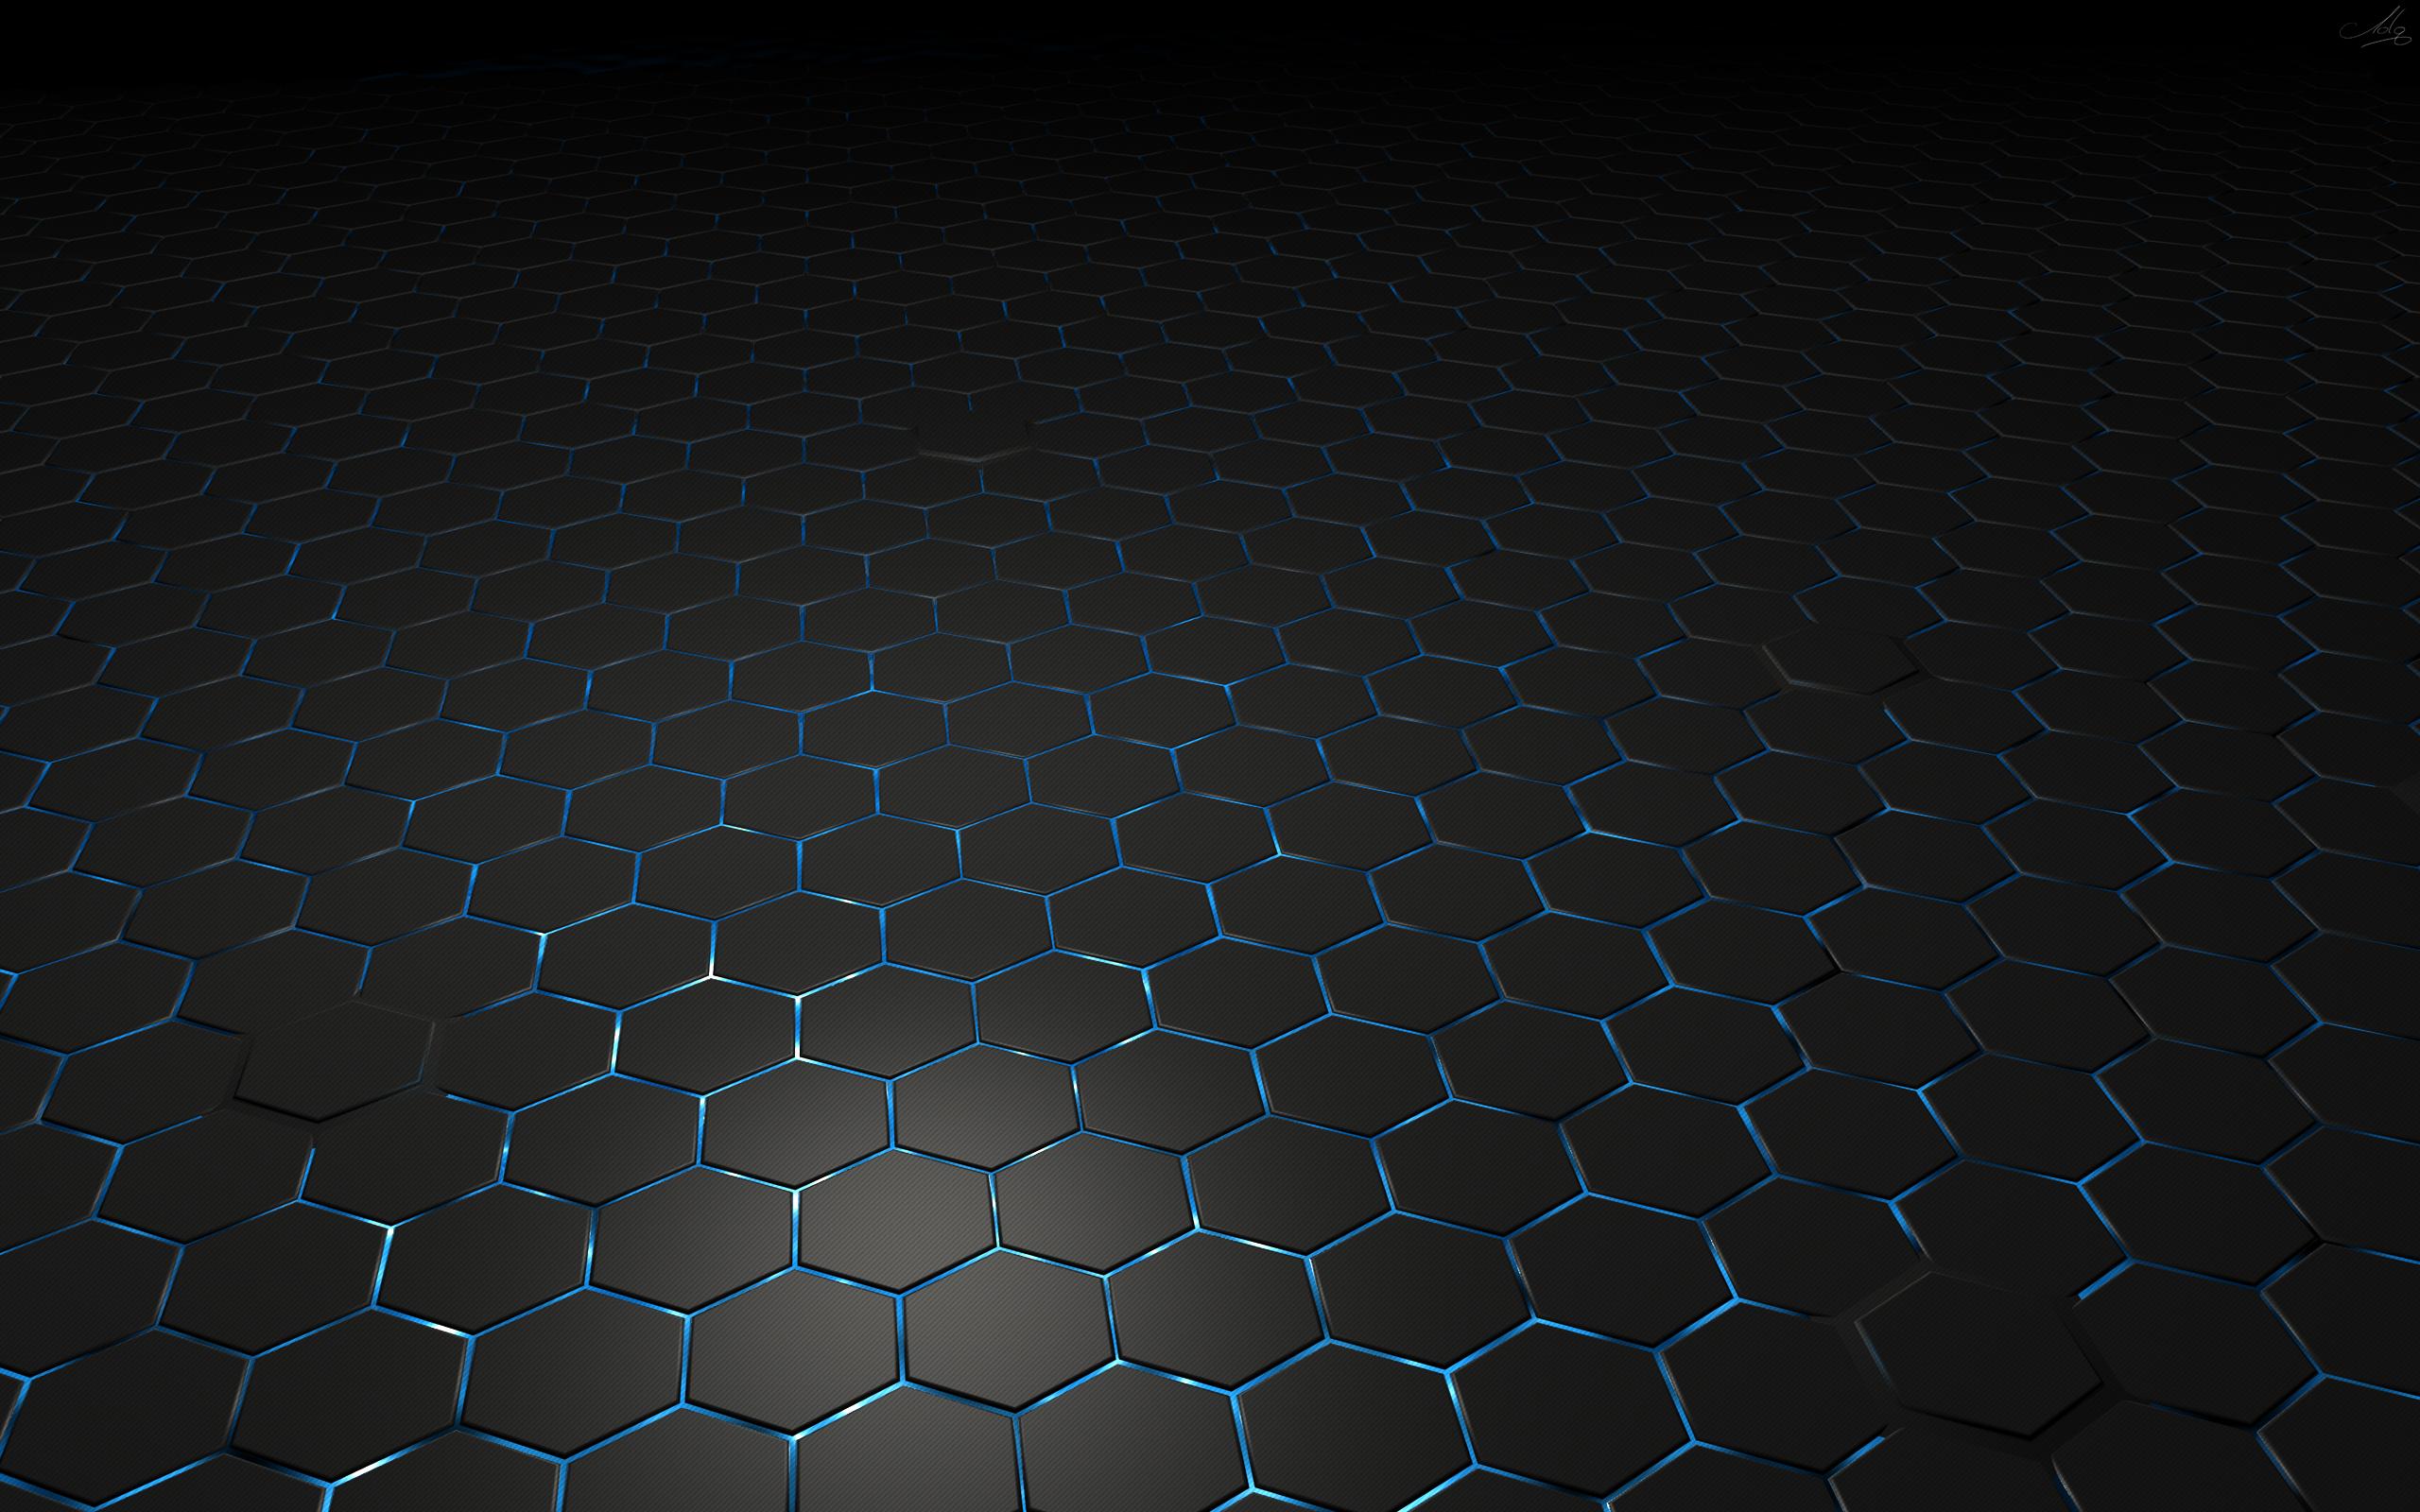 HD Wallpaper Computer Wallpapers Desktop Backgrounds 2560x1600 ID 2560x1600